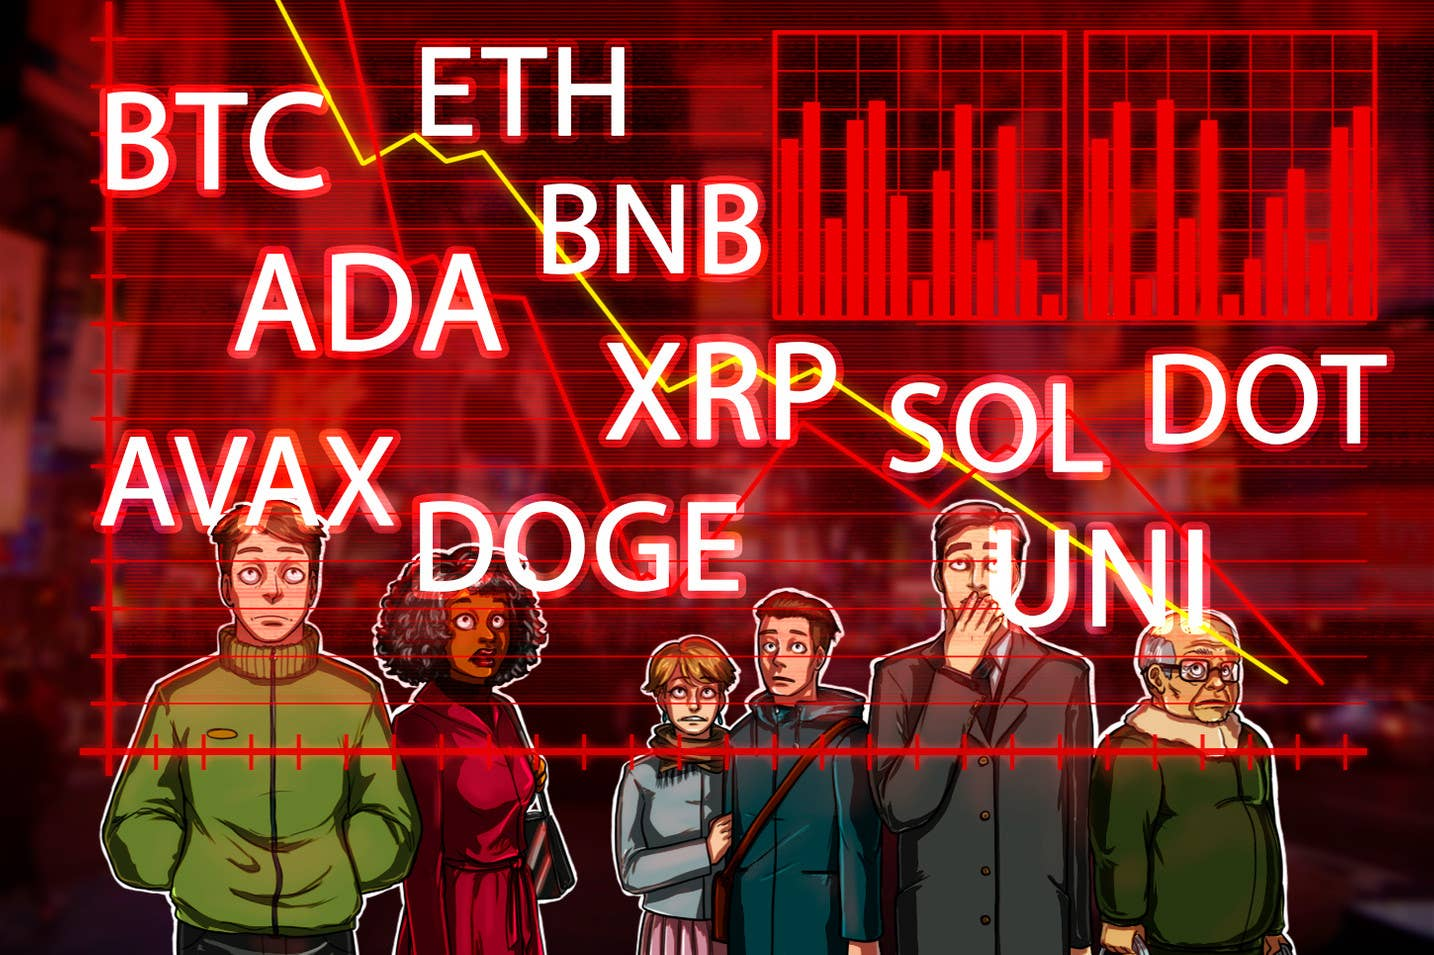 Analiza cen 9/20: BTC, ETH, ADA, BNB, XRP, SOL, DOT, DOGE, UNI, AVAX